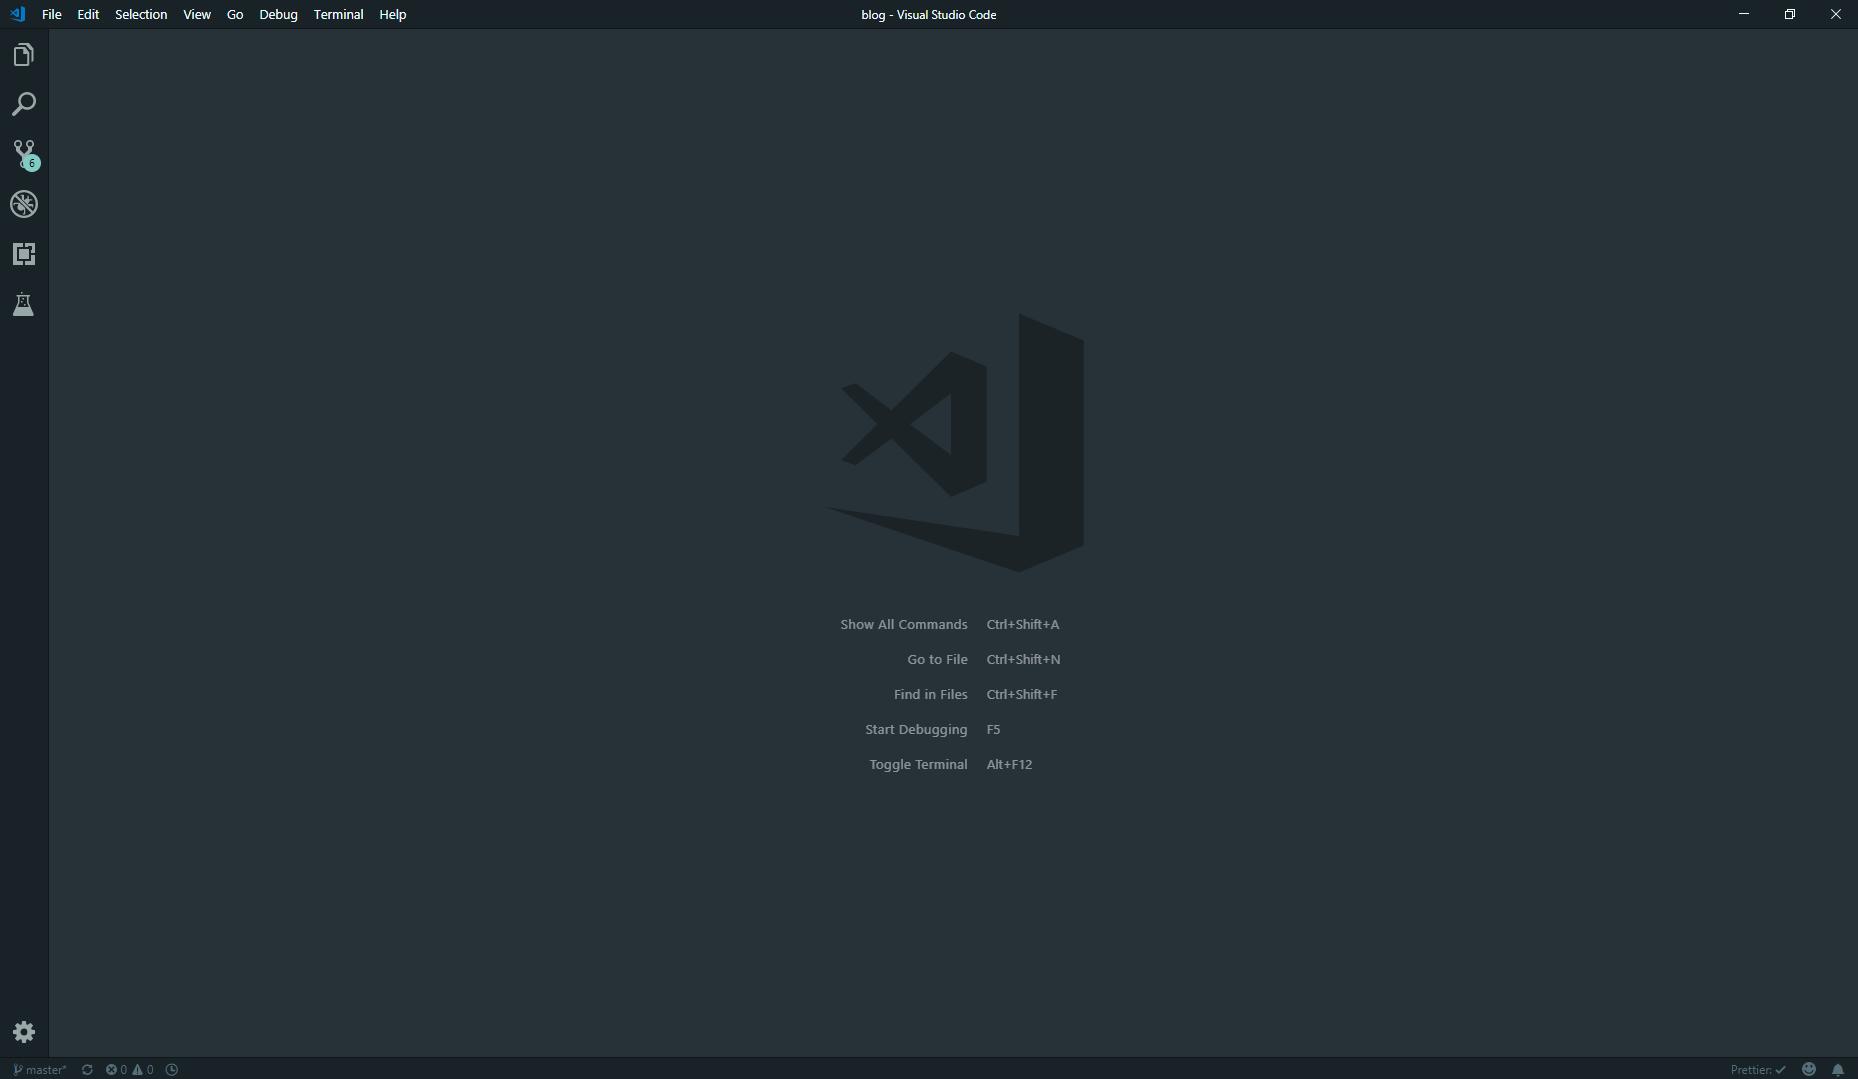 VSCode 首页